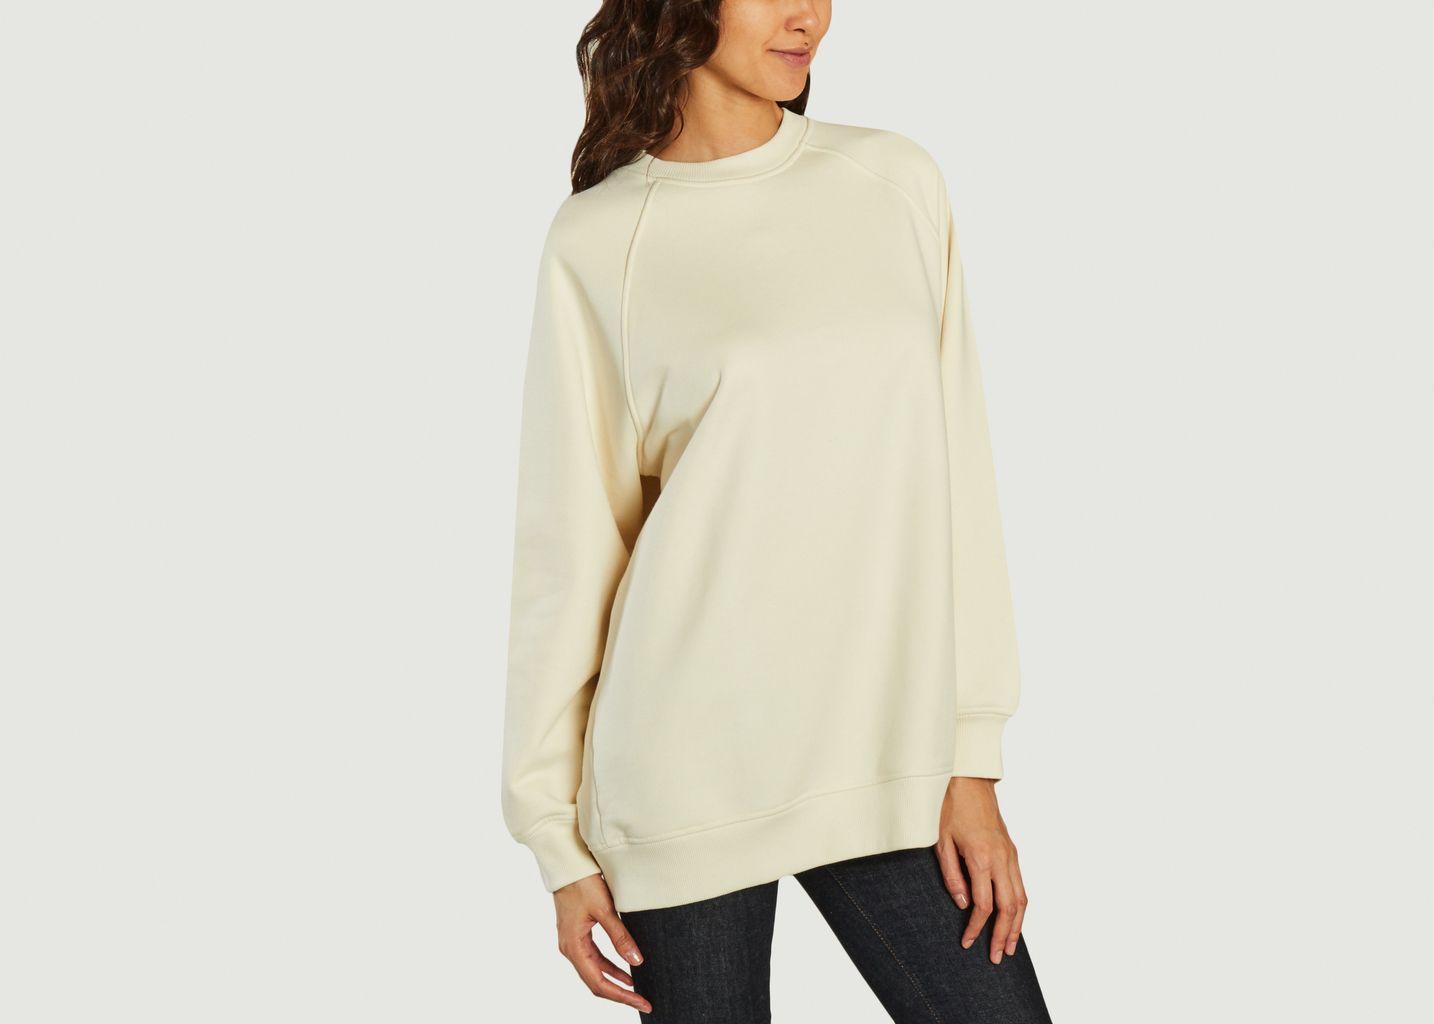 Sweatshirt Undyed W 11719 - Samsoe Samsoe